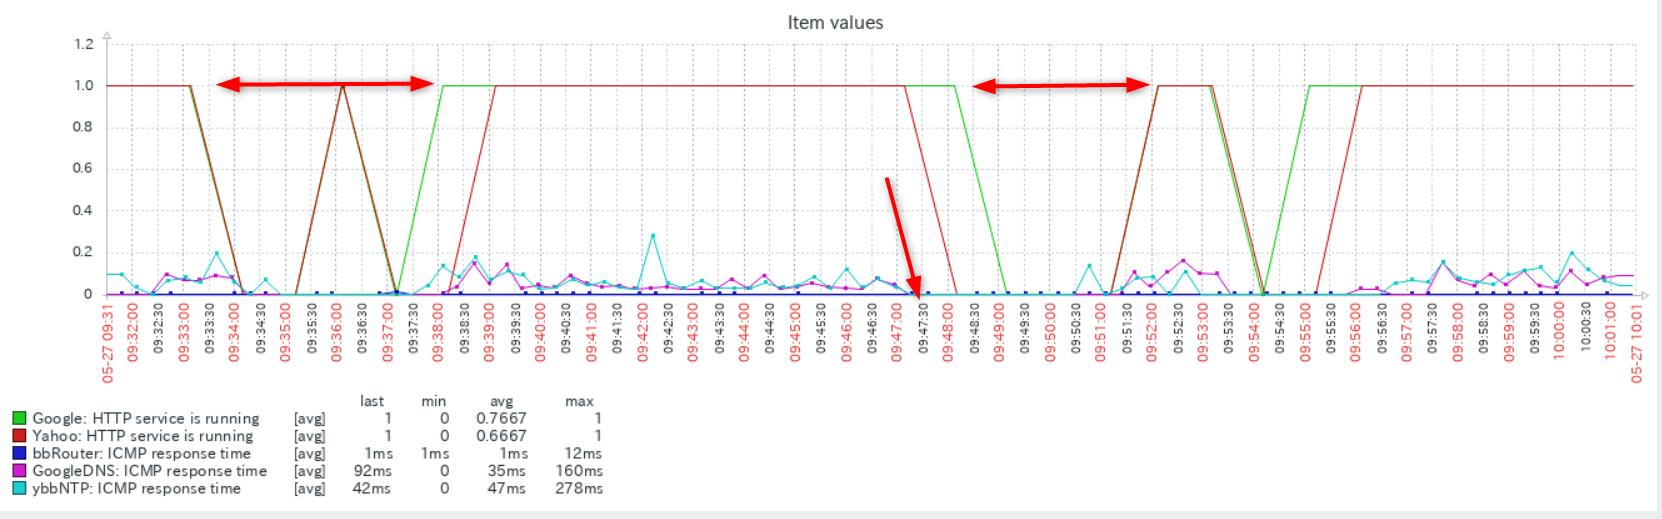 zabbix5 でインターネットの疎通、監視、リモートワーク時代の「ネットが遅い」をチェック_a0056607_12260847.png